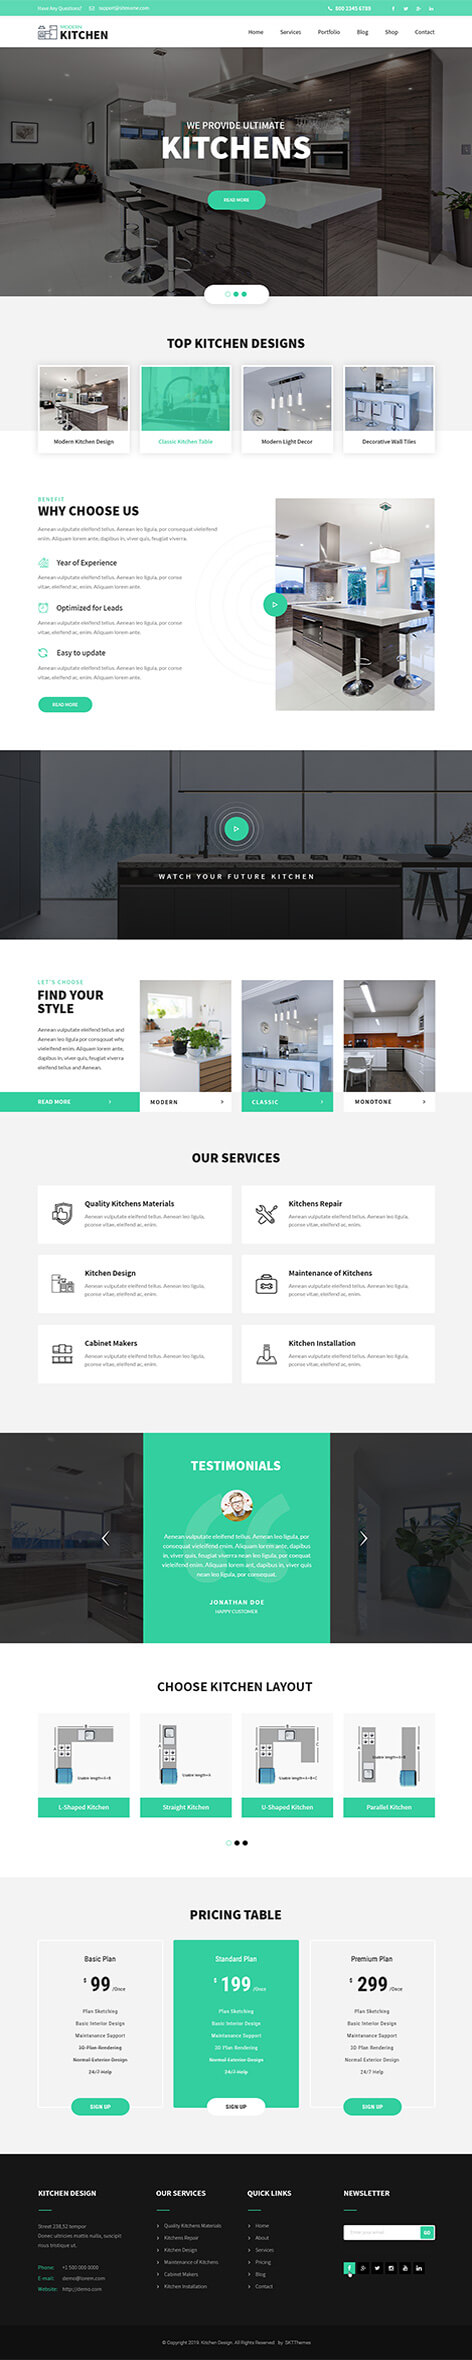 kitchen cabinets WordPress theme